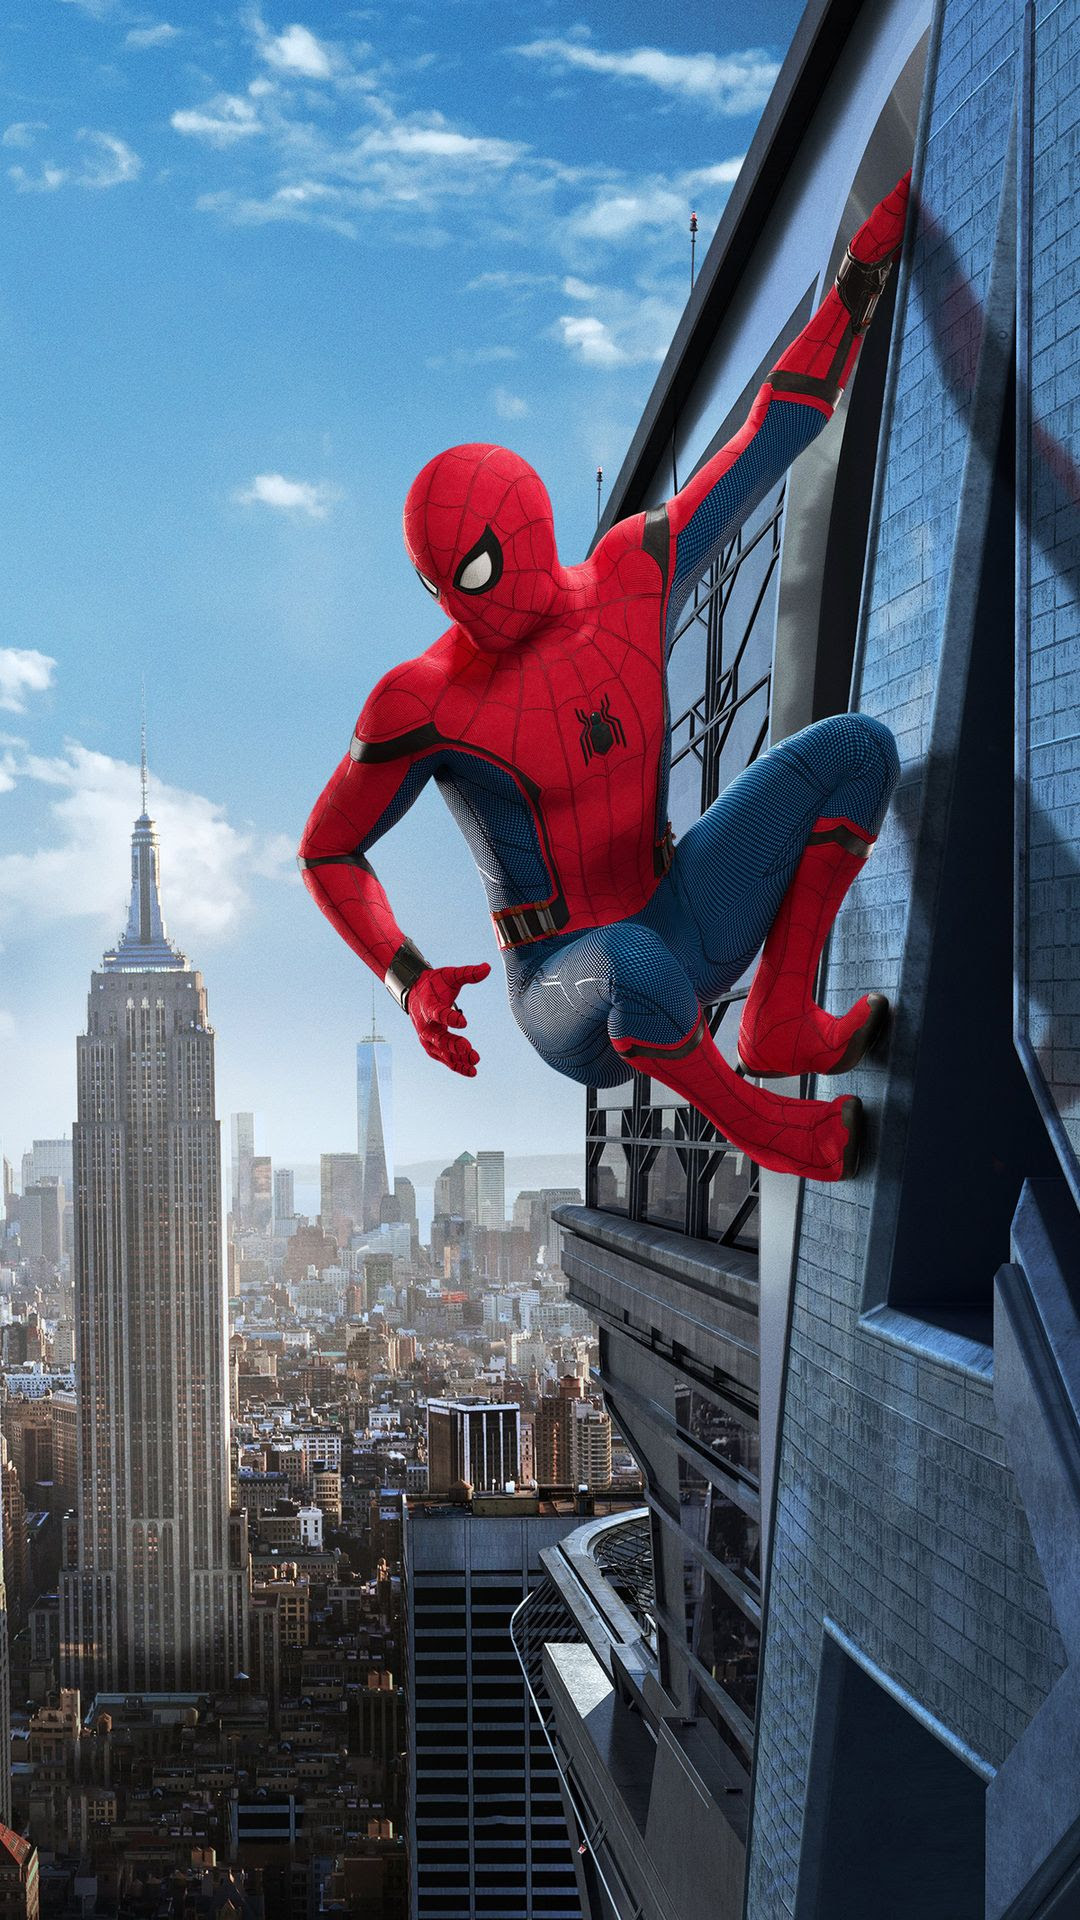 Spiderman Infinity War Wallpaper 4k